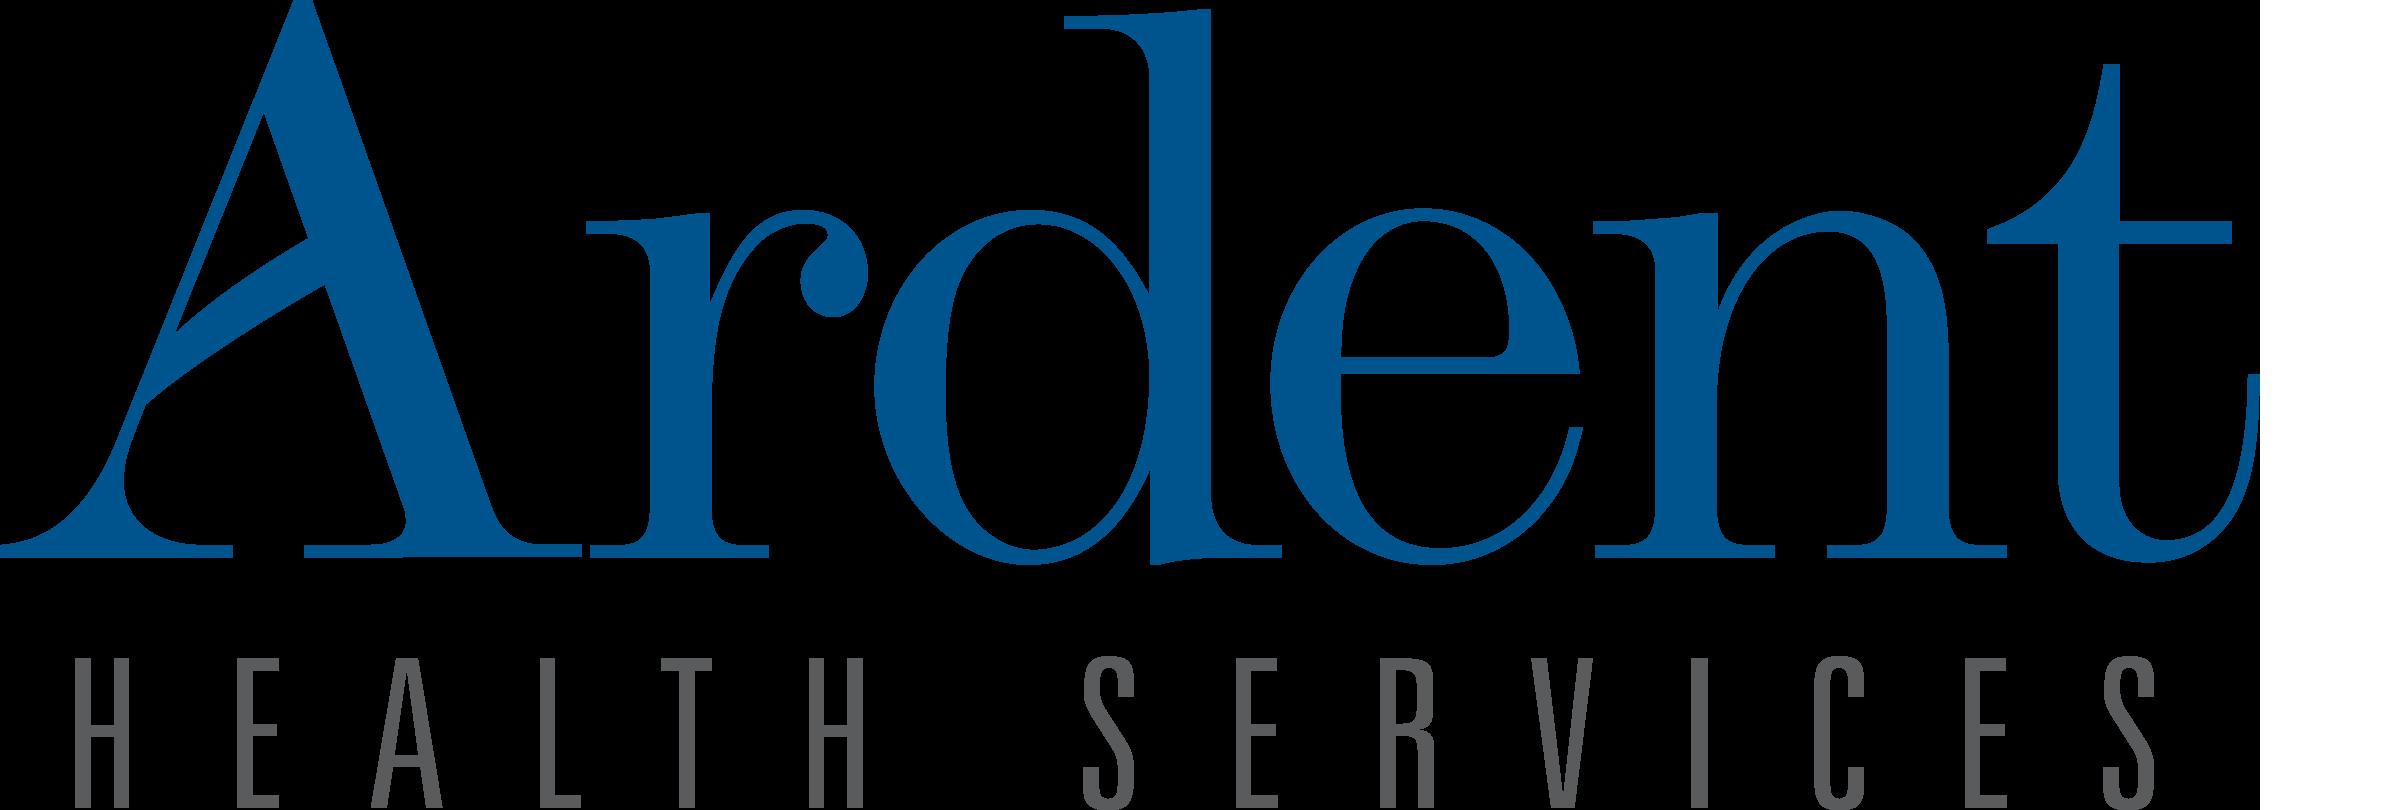 Ardent Health Services Company Logo